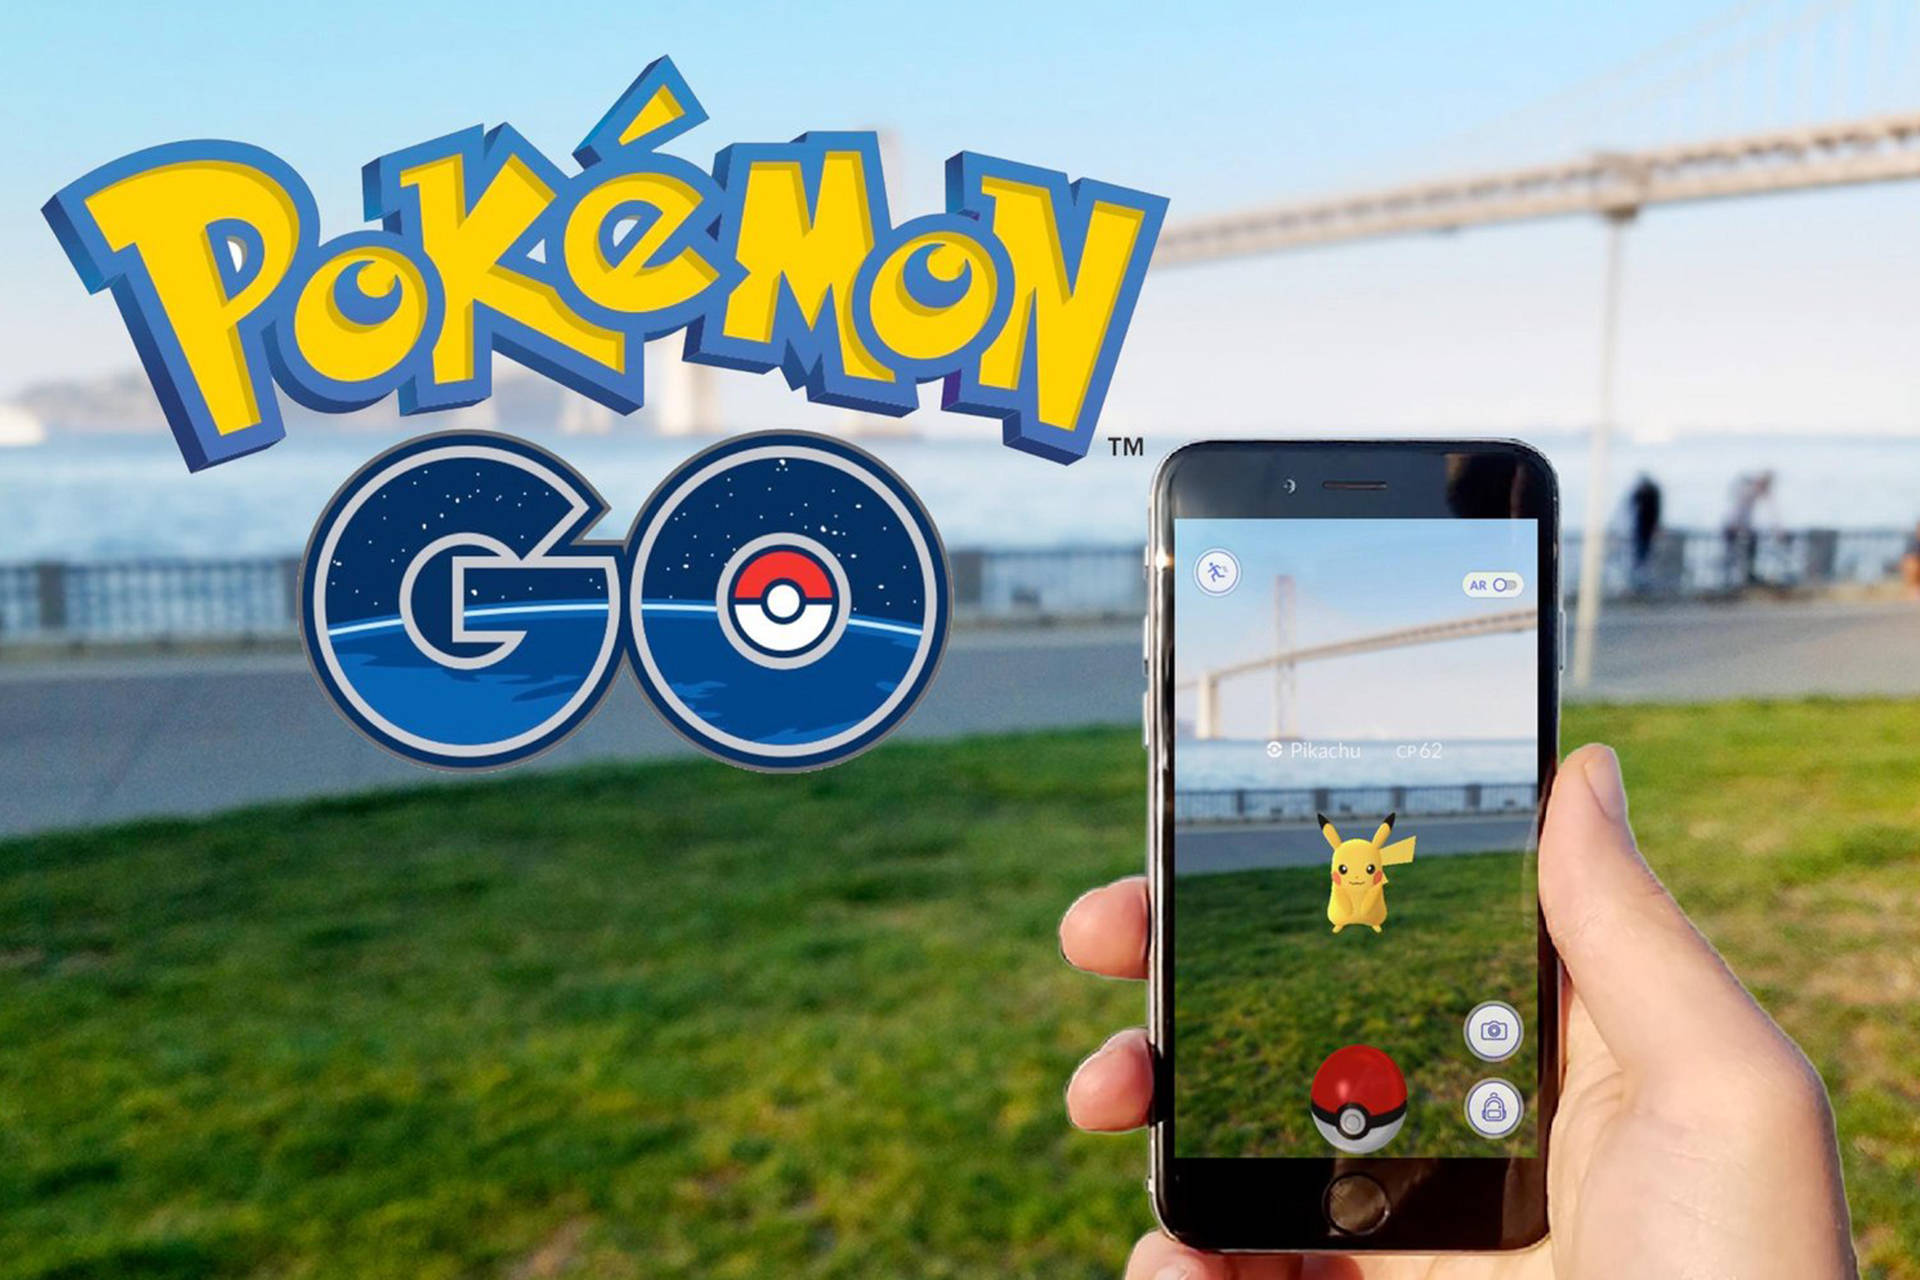 Pokemon Go: come trovare Pokemon rari con Ingress